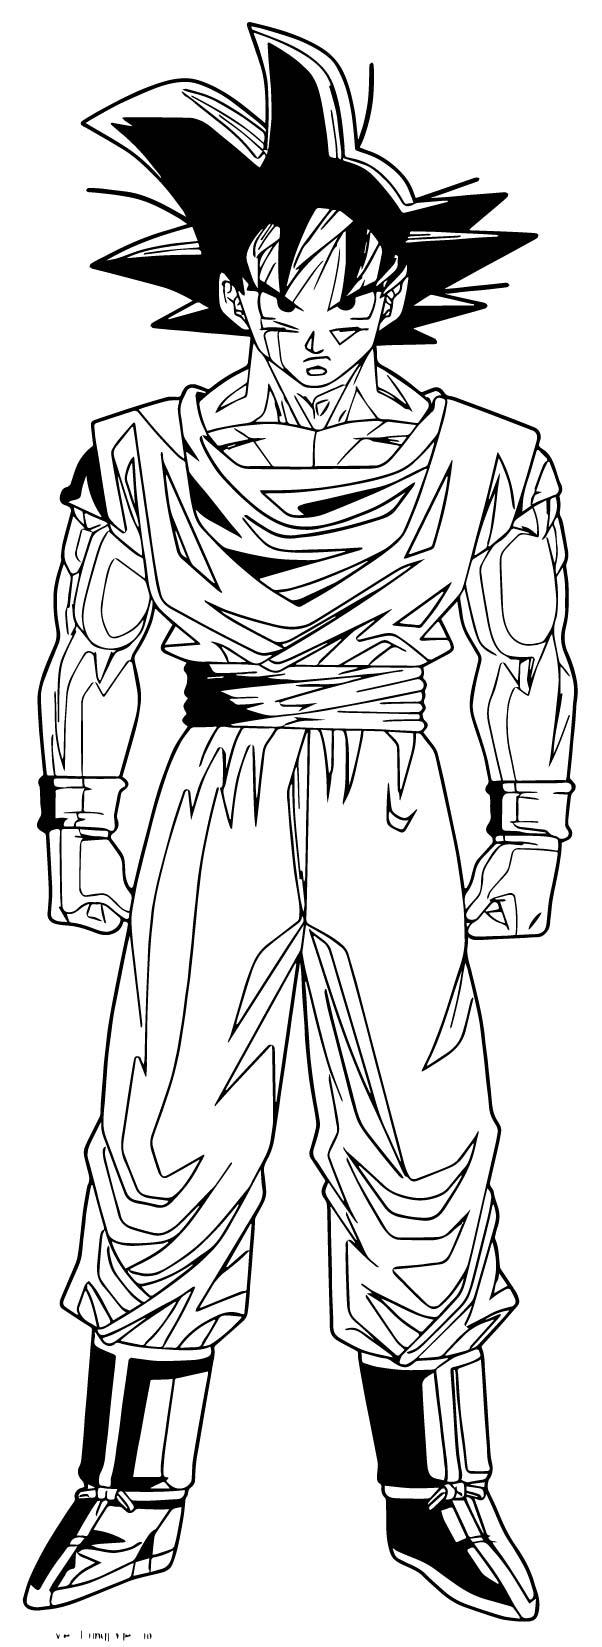 Goku We Coloring Page 168